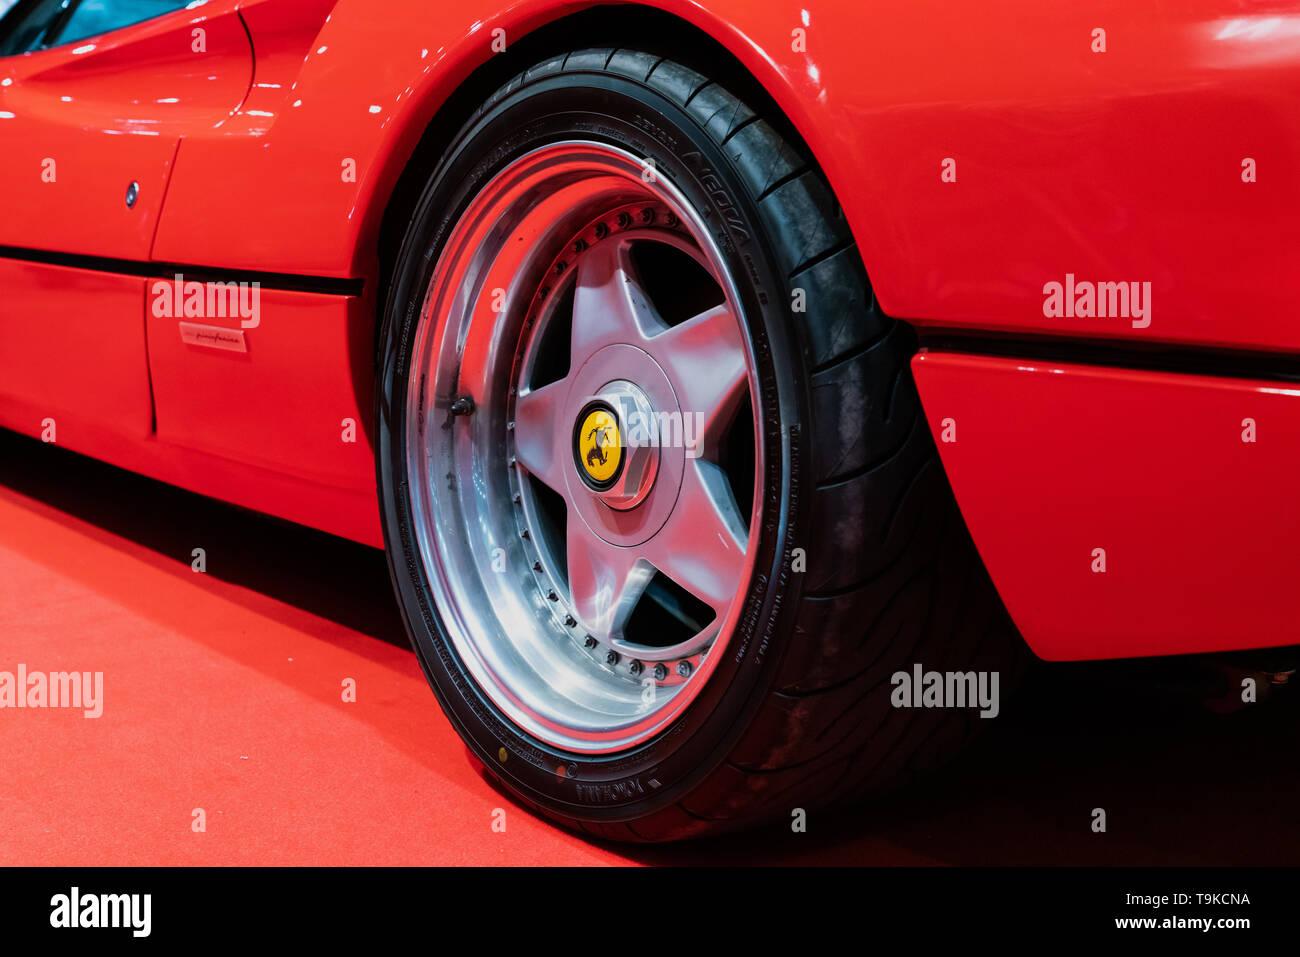 18th May 2019. London, UK. Iconic Ferrari F40 17-inch split-rim 5-spoke Speedline alloy wheels mounted on a 308 model at London Motor Show 2019. - Stock Image